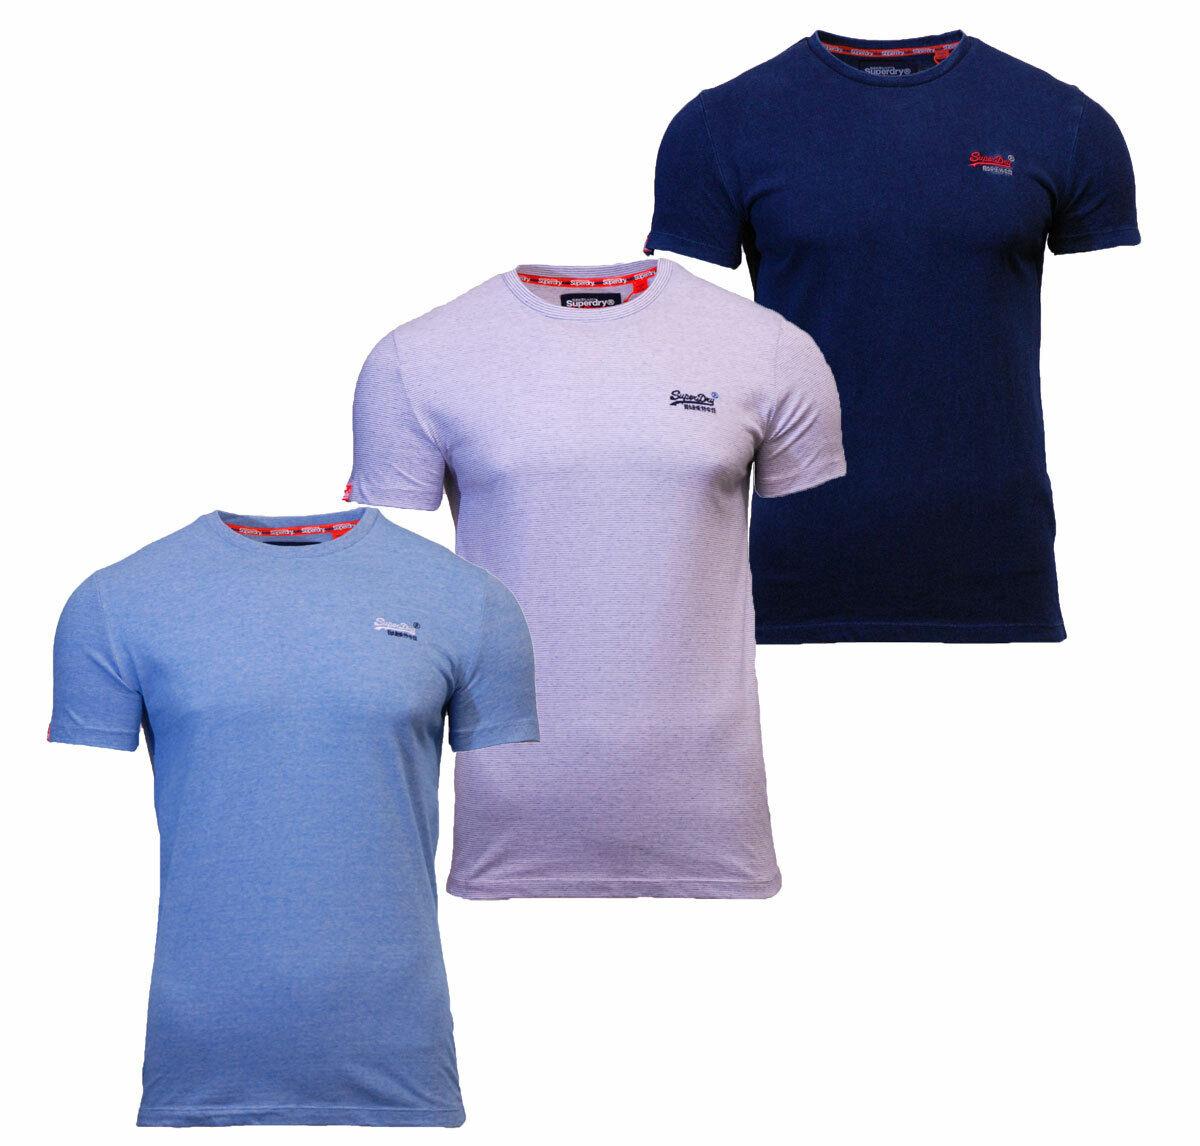 Superdry Mens Orange Label Crew Neck Short Sleeve T Shirt Indigo White Sky Blue